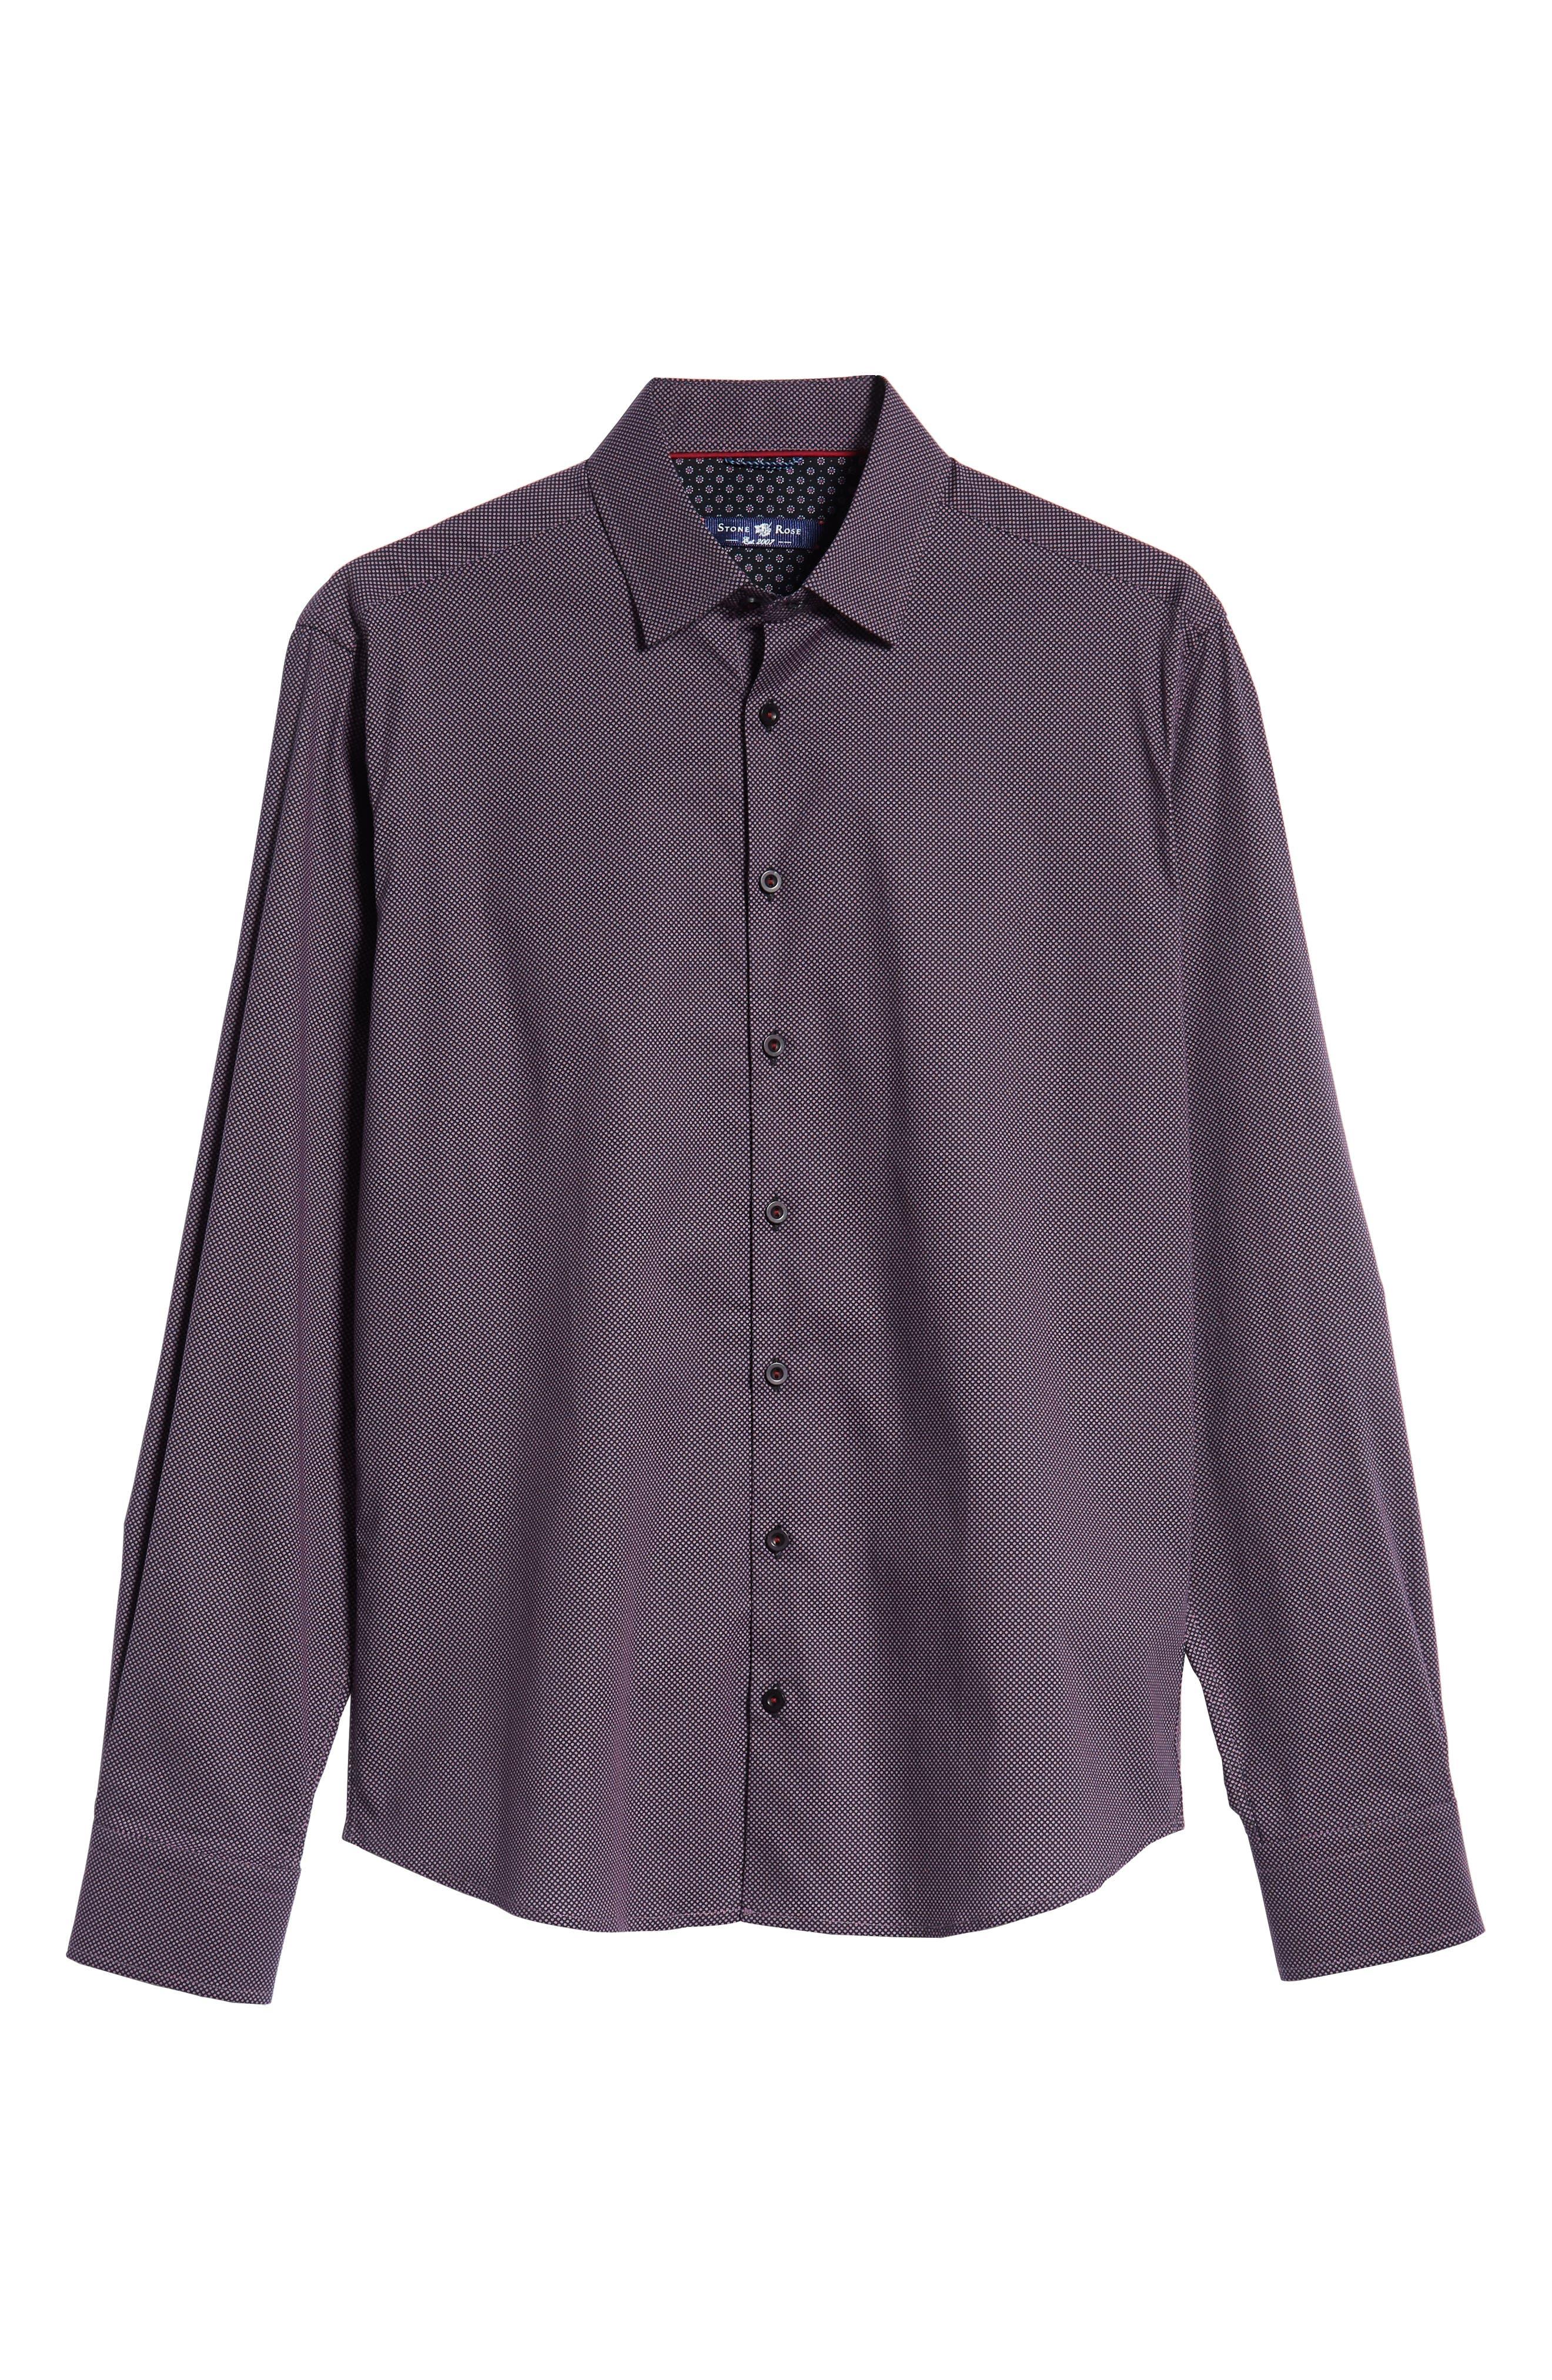 Regular Fit Microdot Sport Shirt,                             Alternate thumbnail 5, color,                             BLACK